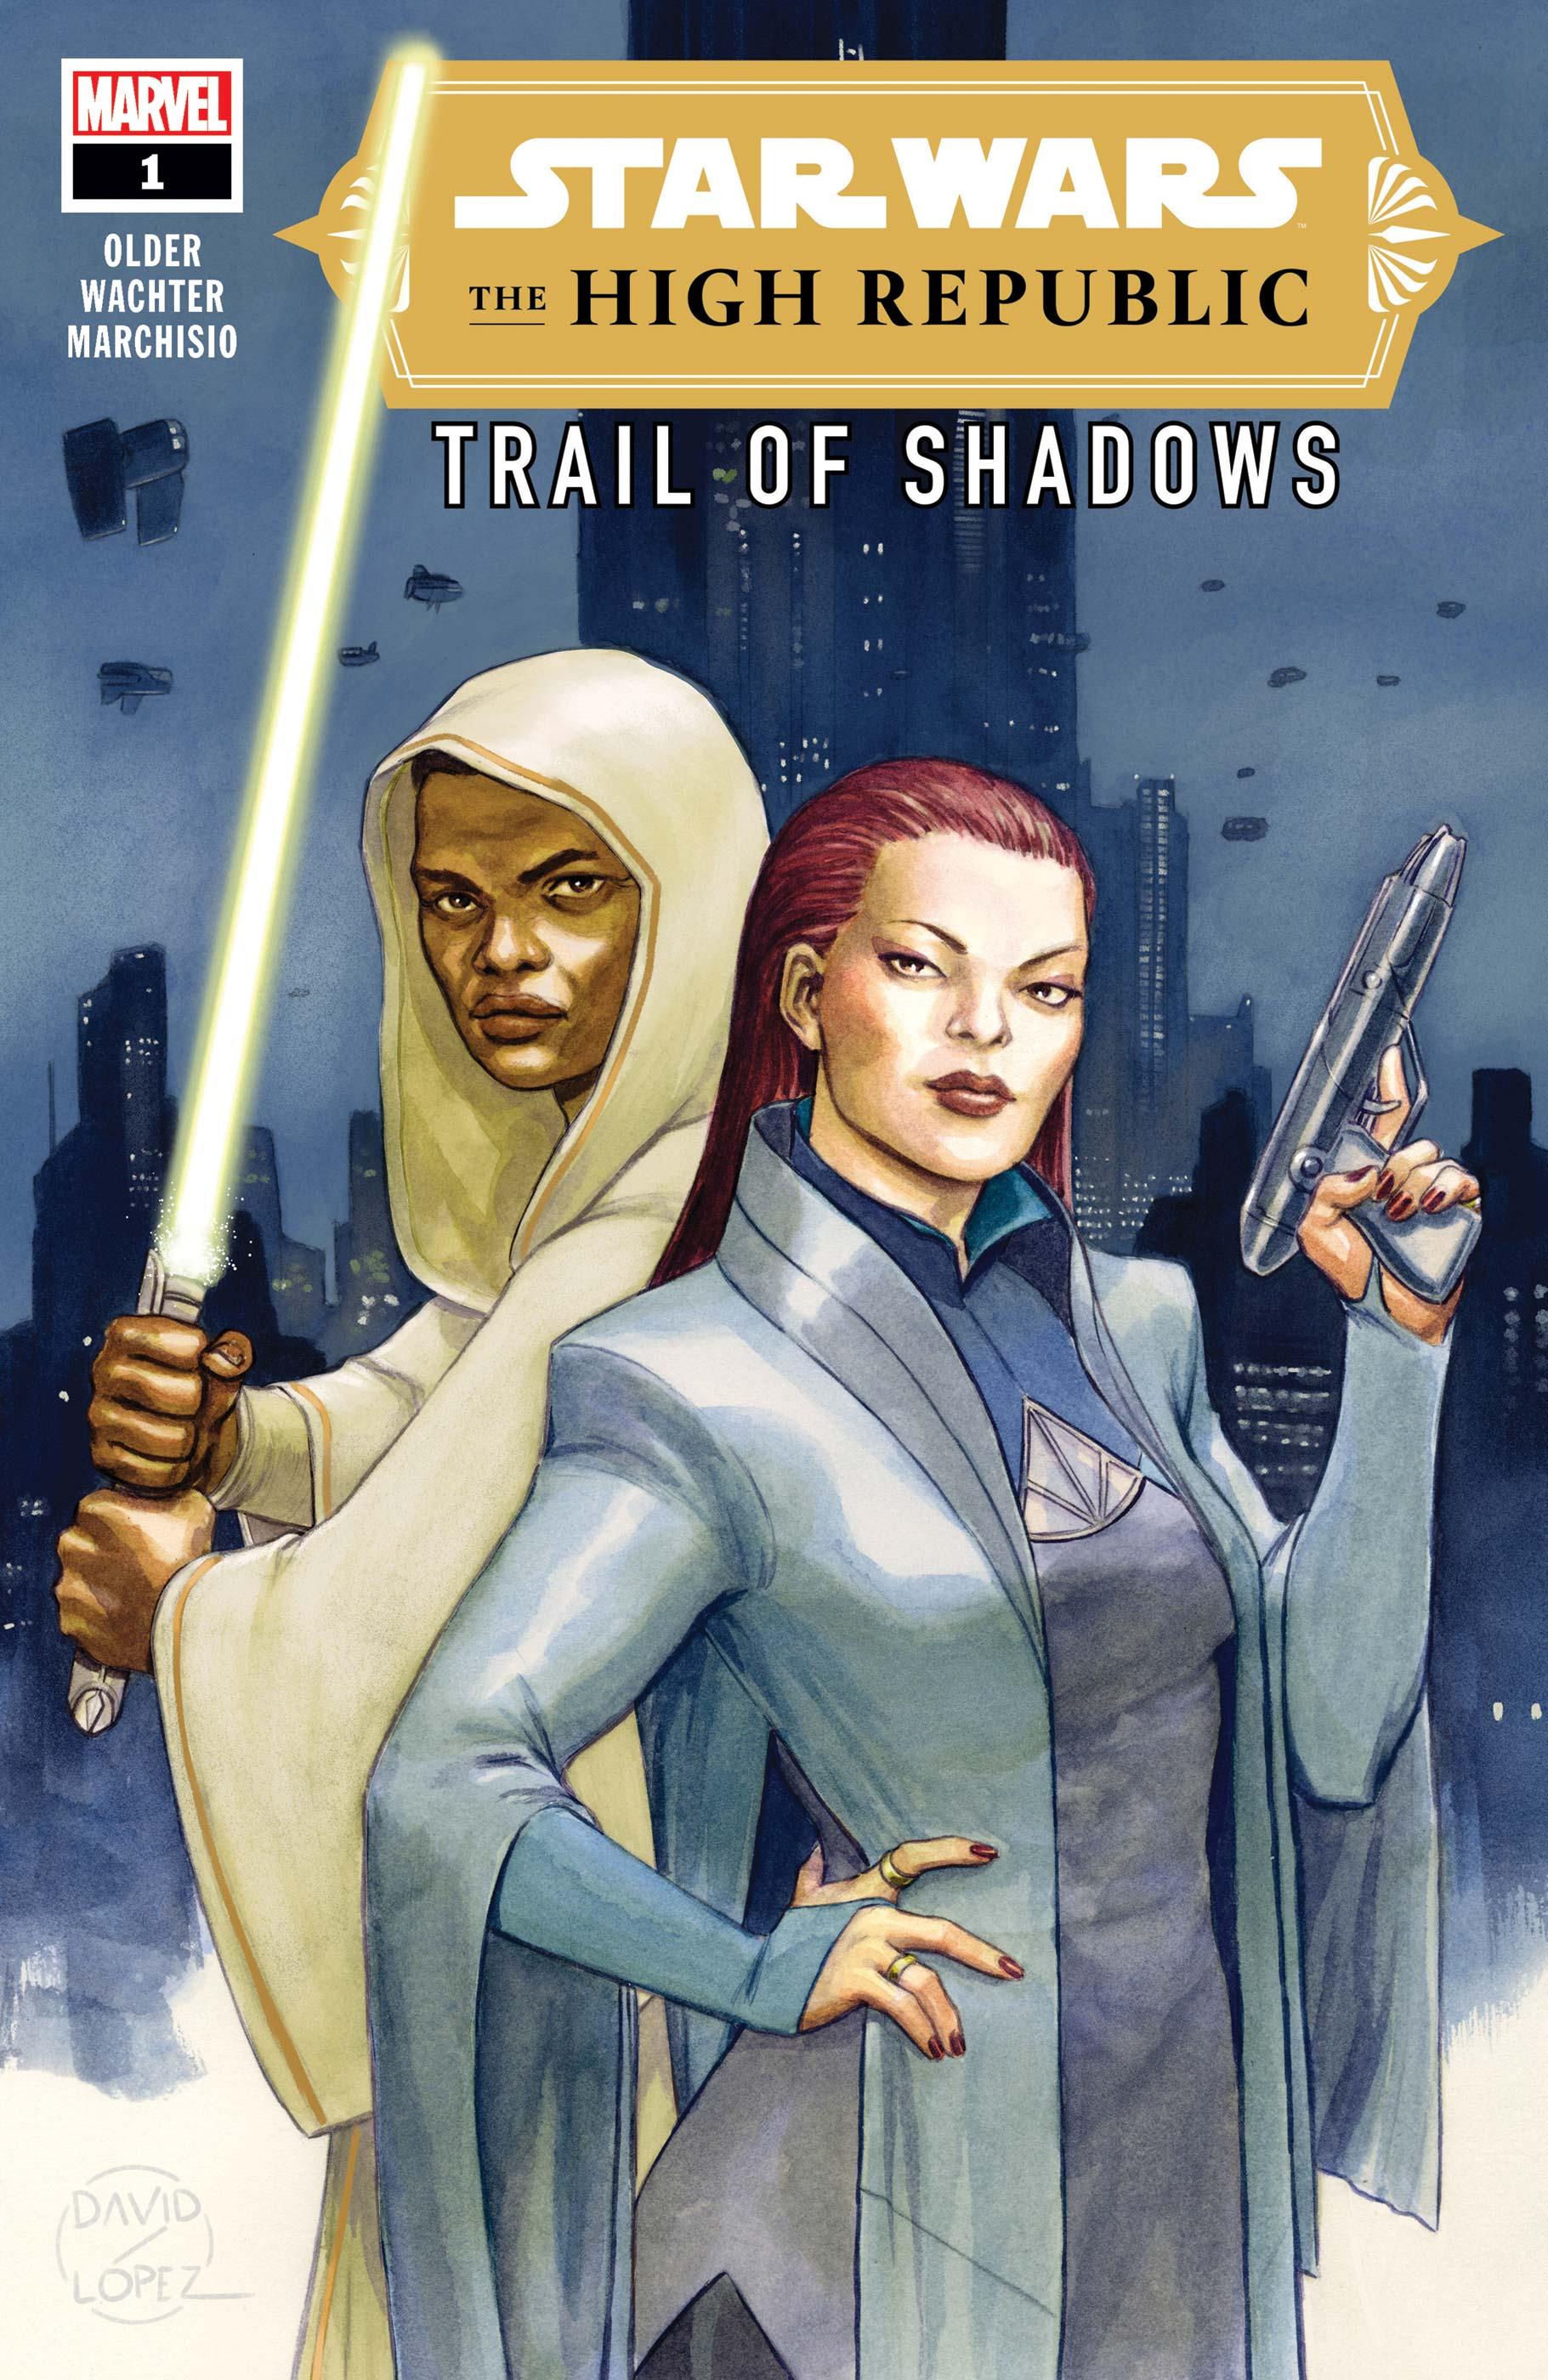 Star Wars: The High Republic - Trail of Shadows (2021) #1